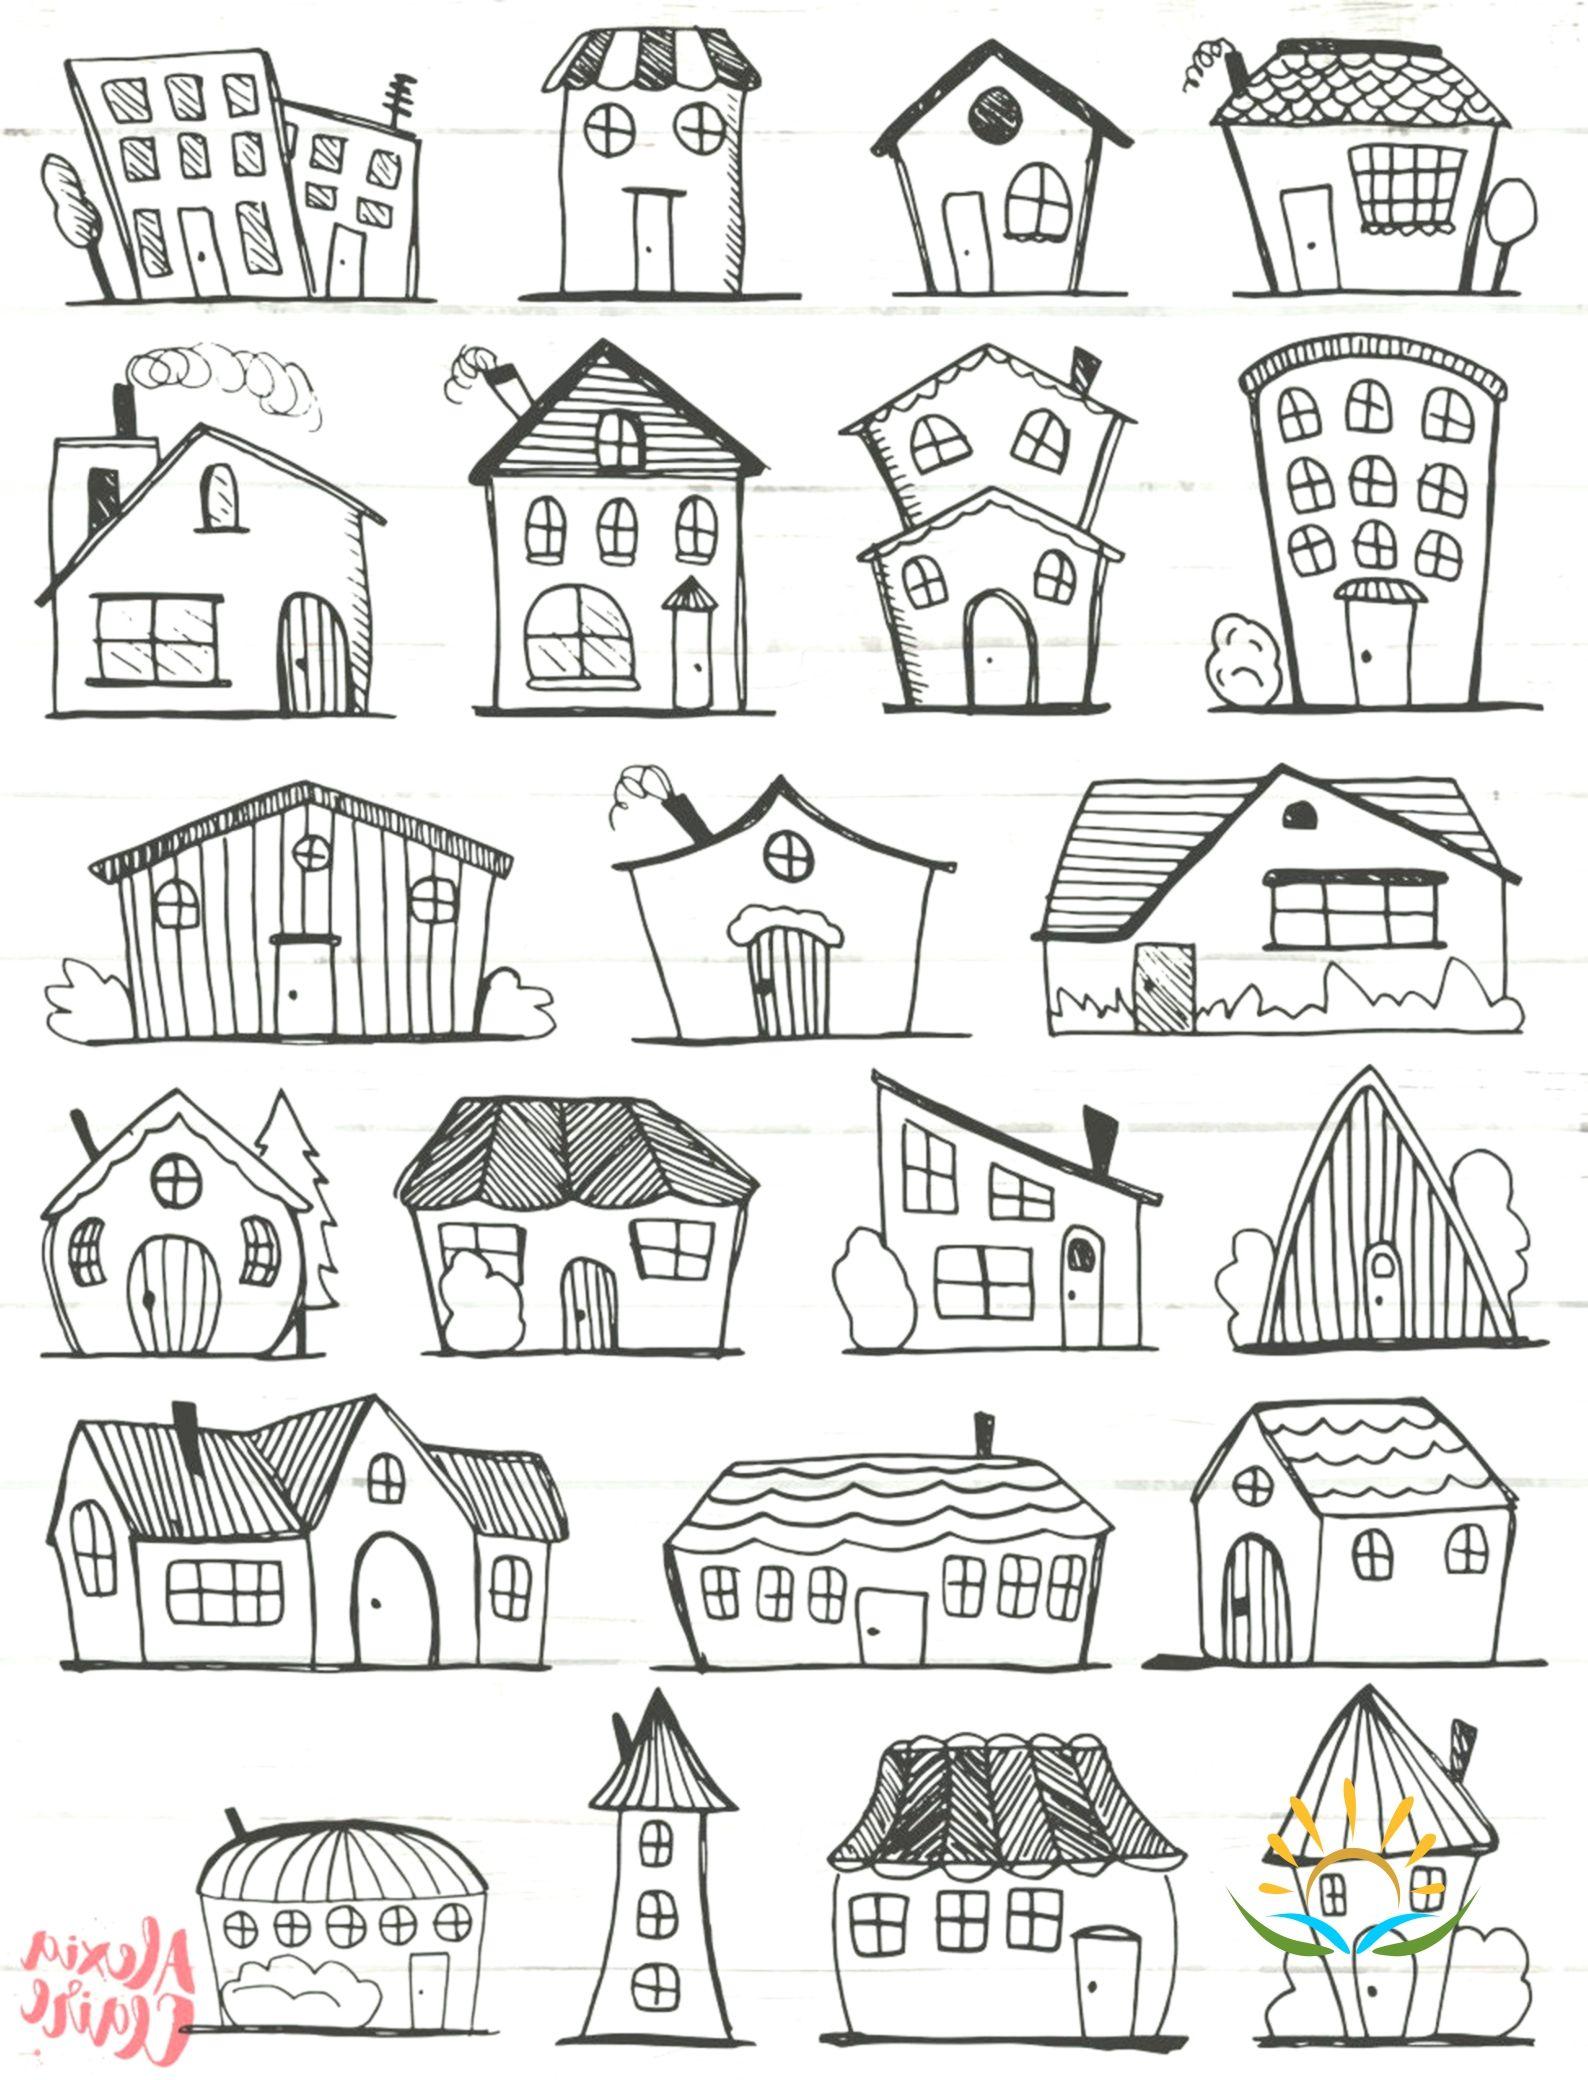 Doodle House Clipart House Vector Art House House City City House Png Home Vect House Illustration House Clipart House Vector